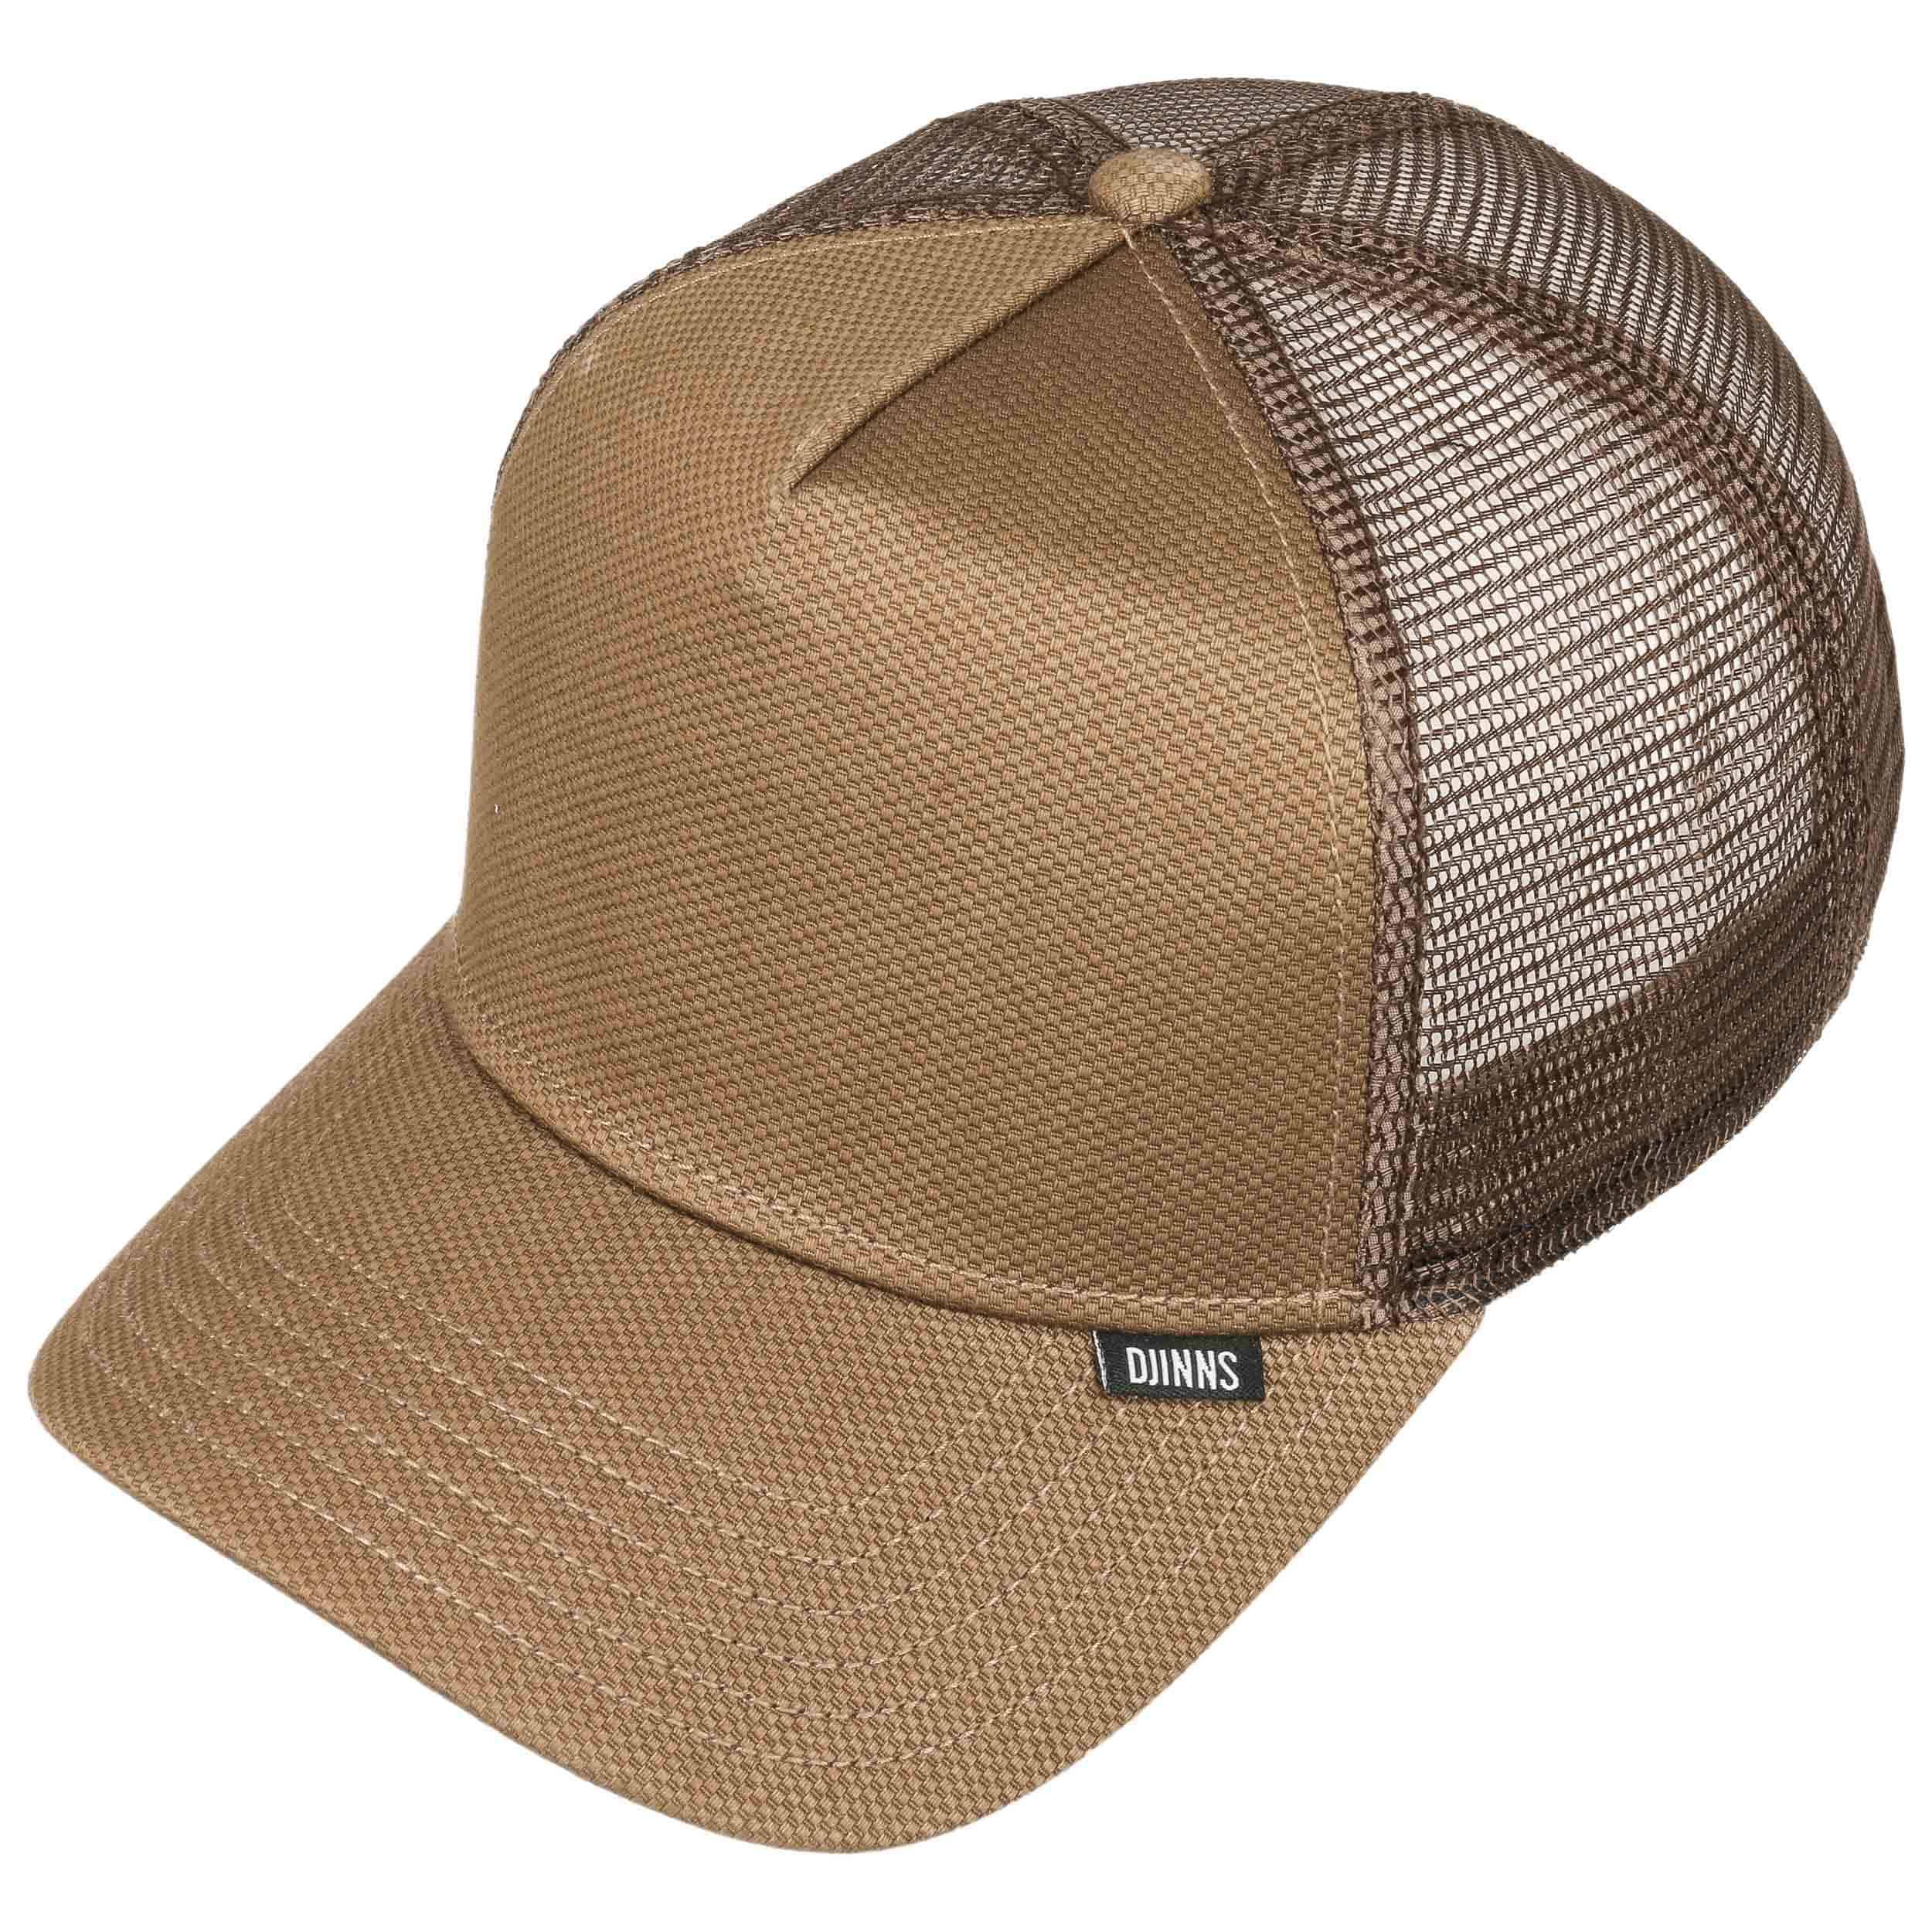 hump camo hft trucker cap by djinns eur 21 95 hats. Black Bedroom Furniture Sets. Home Design Ideas